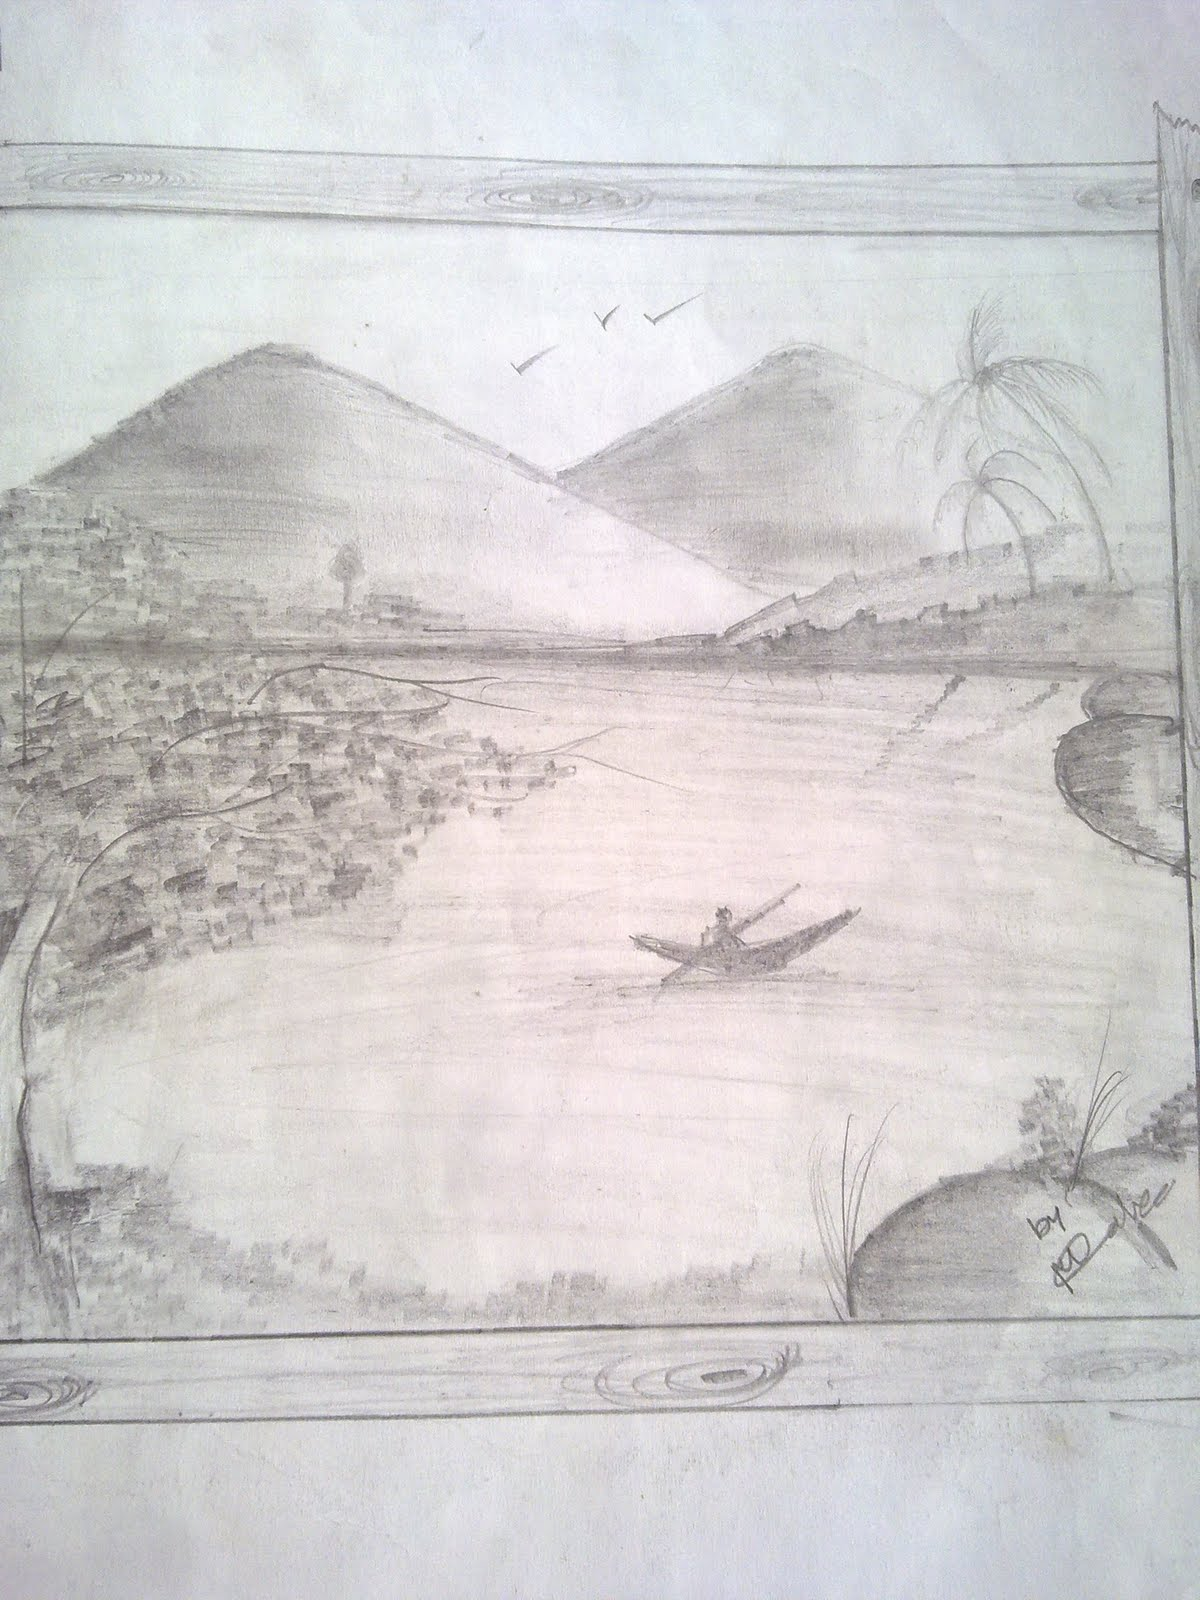 indian drawings: NATURE IN PENCILE DRAWINGS